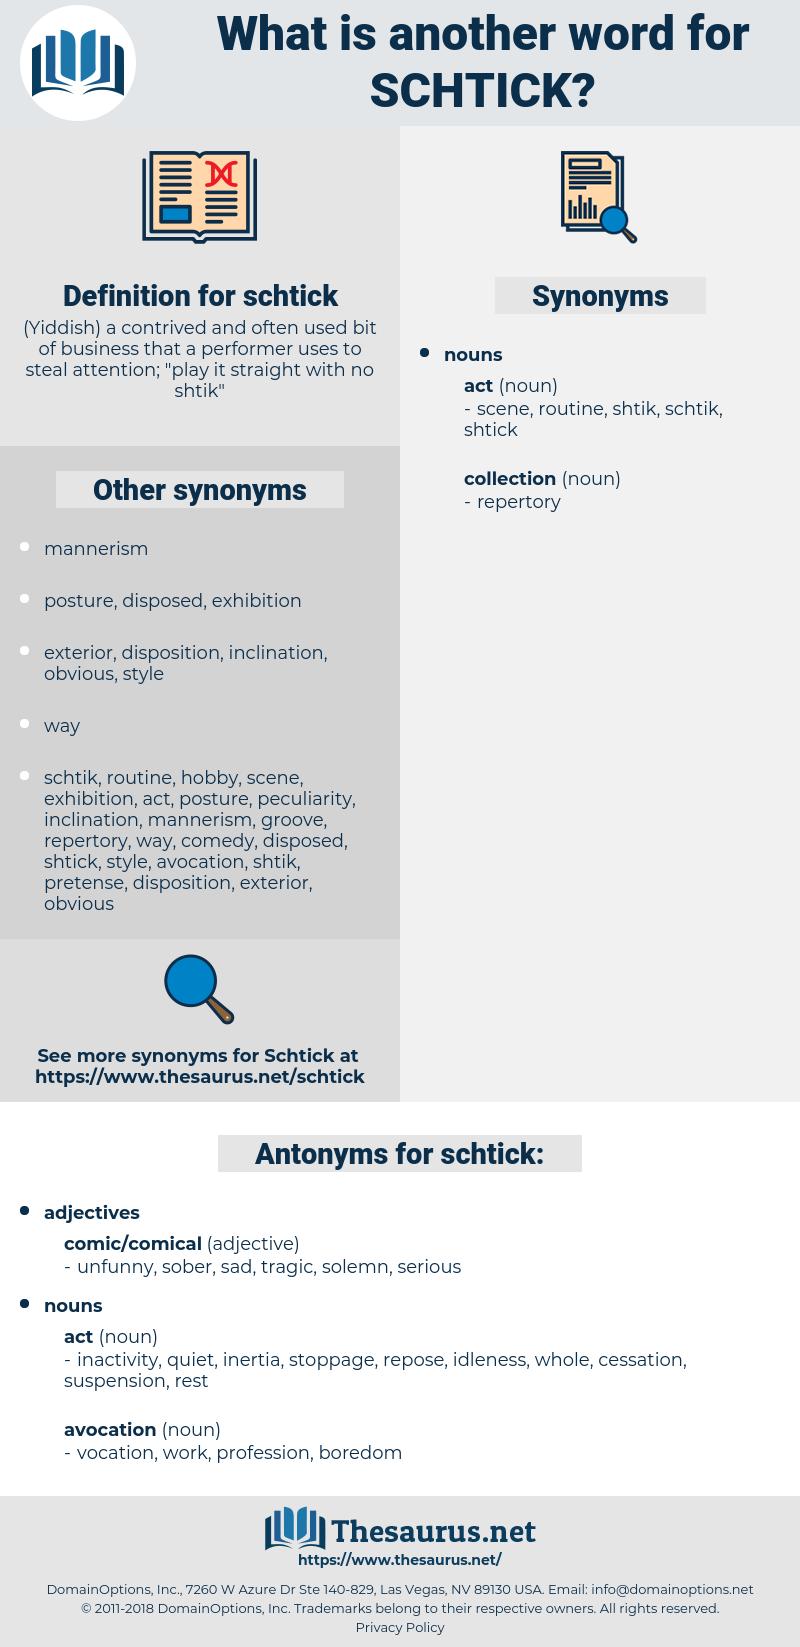 schtick, synonym schtick, another word for schtick, words like schtick, thesaurus schtick